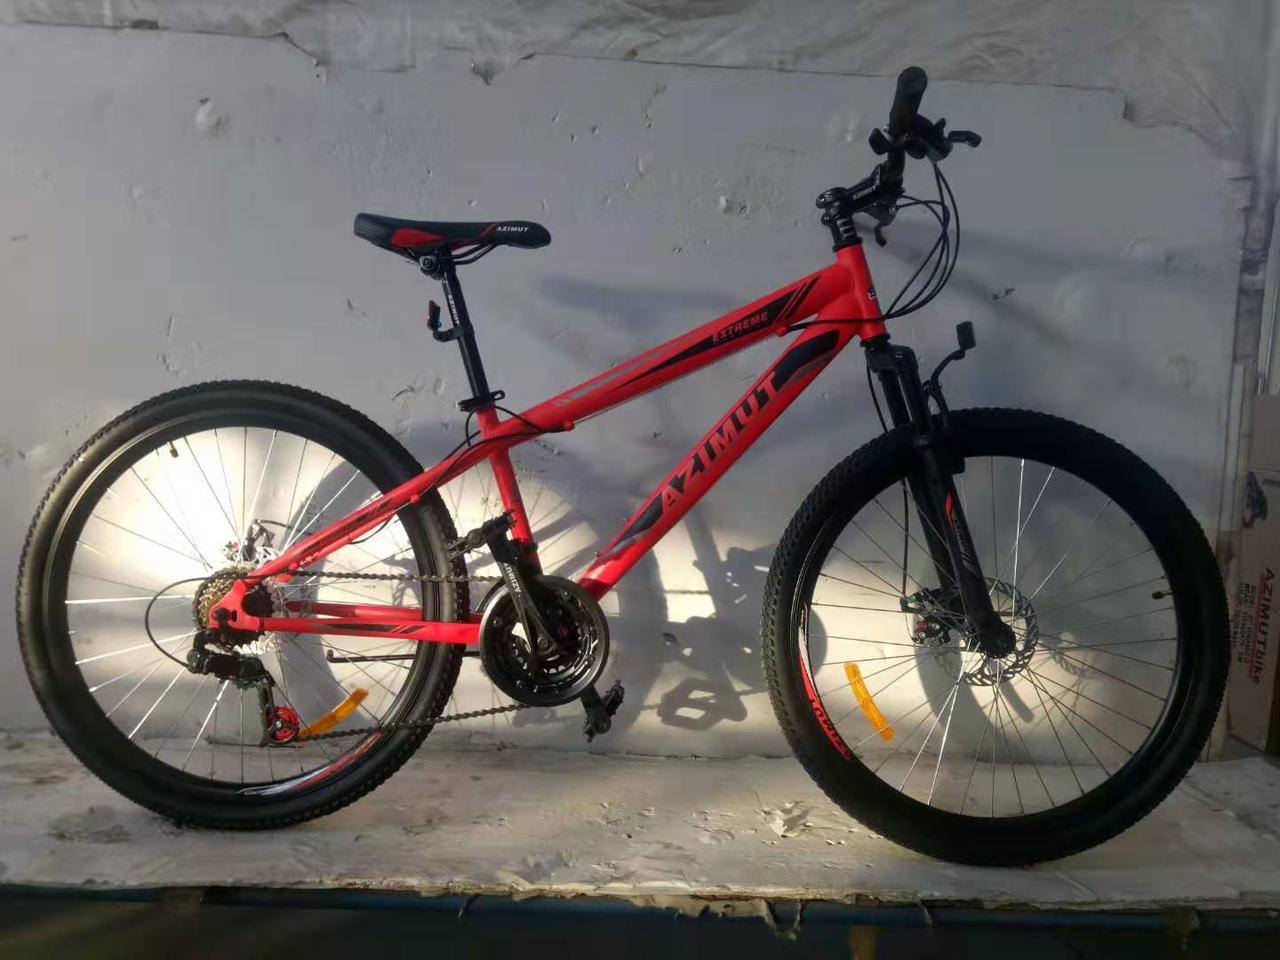 Горный подростковый велосипед Extreme 24 дюйма 13 рама  FRD Азимут